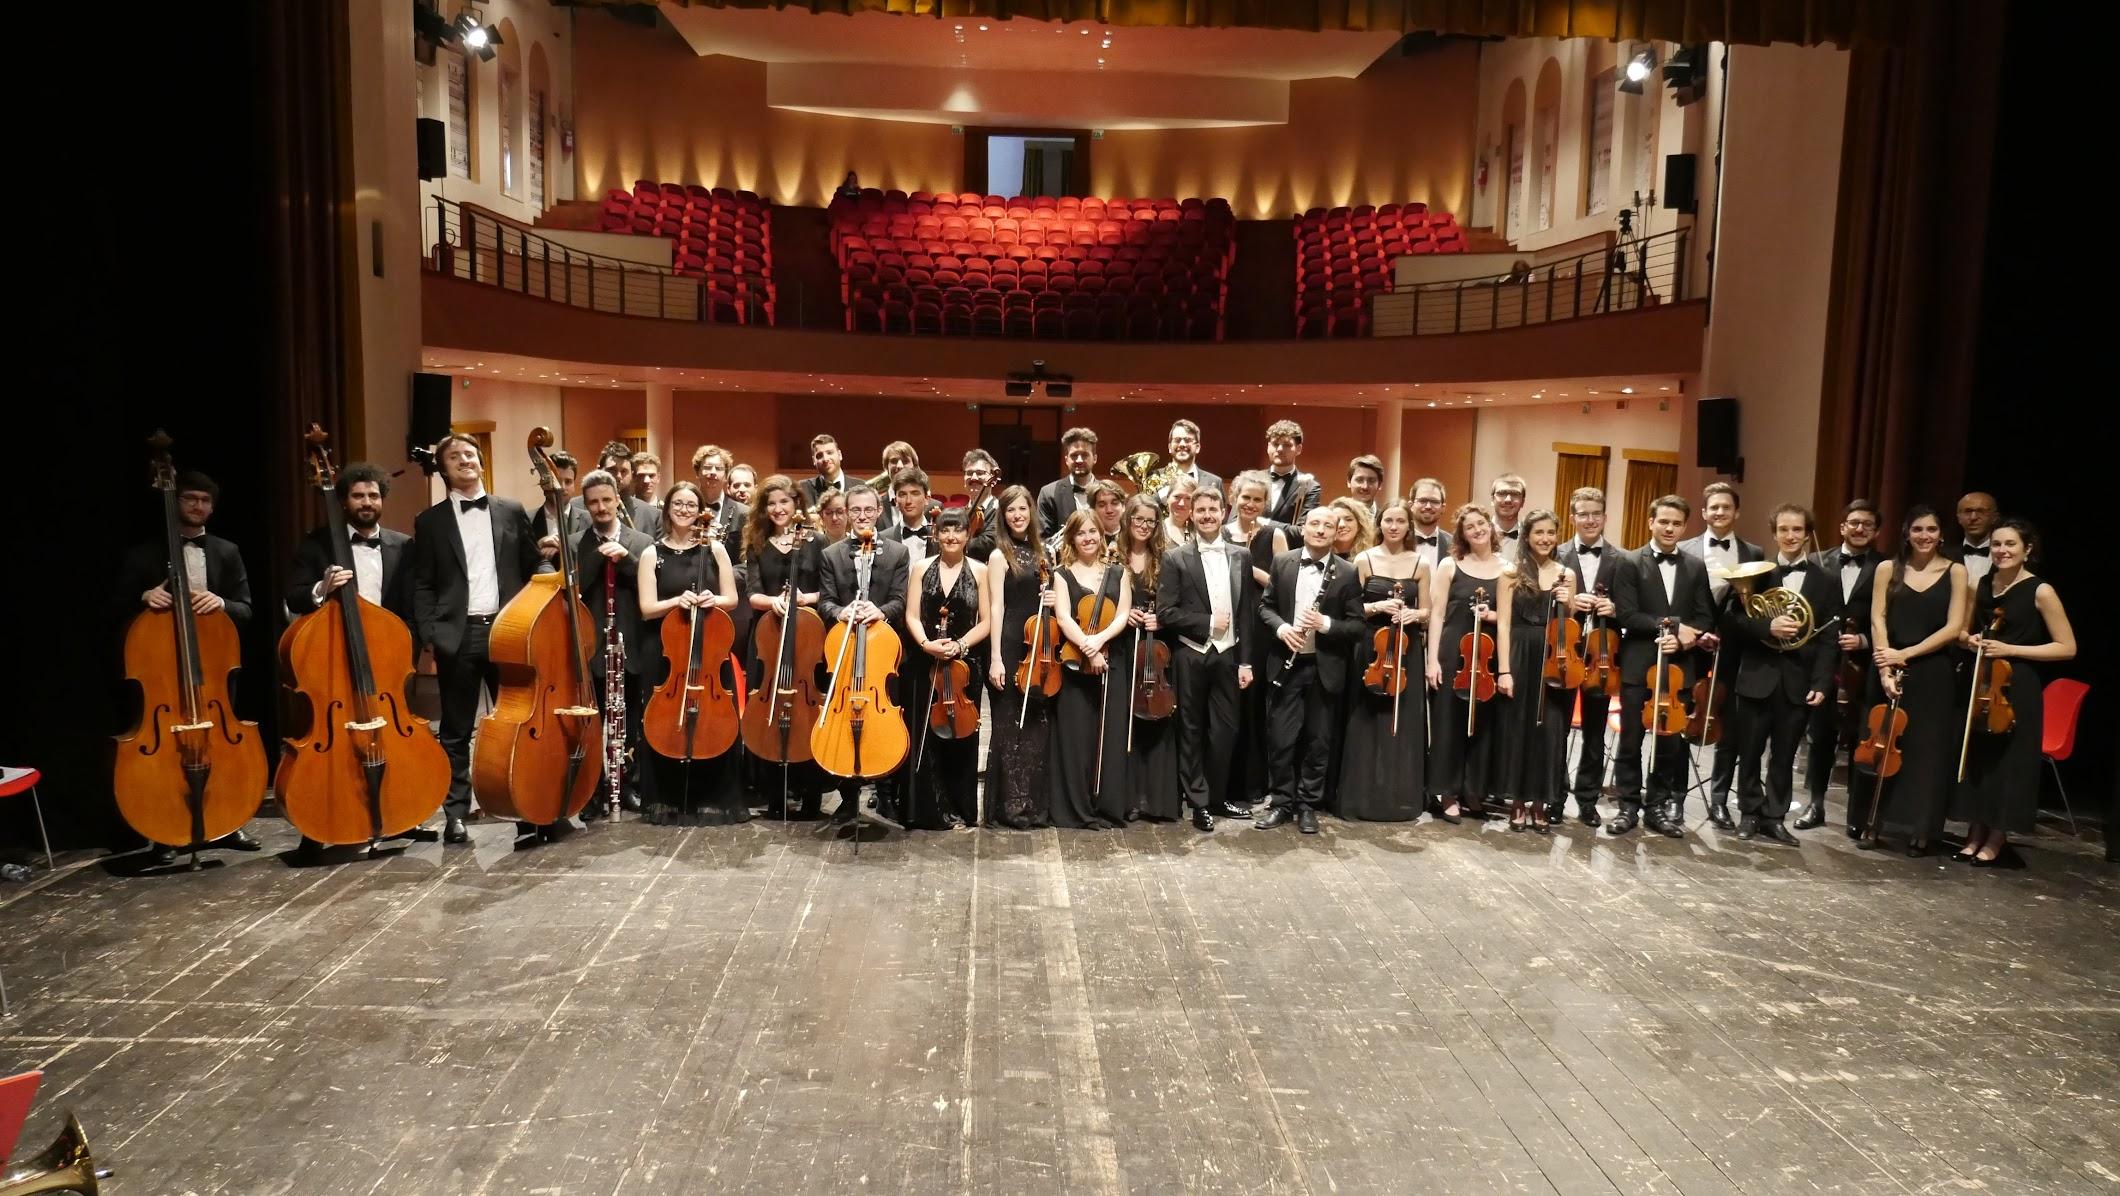 Venice Chamber Orchestra